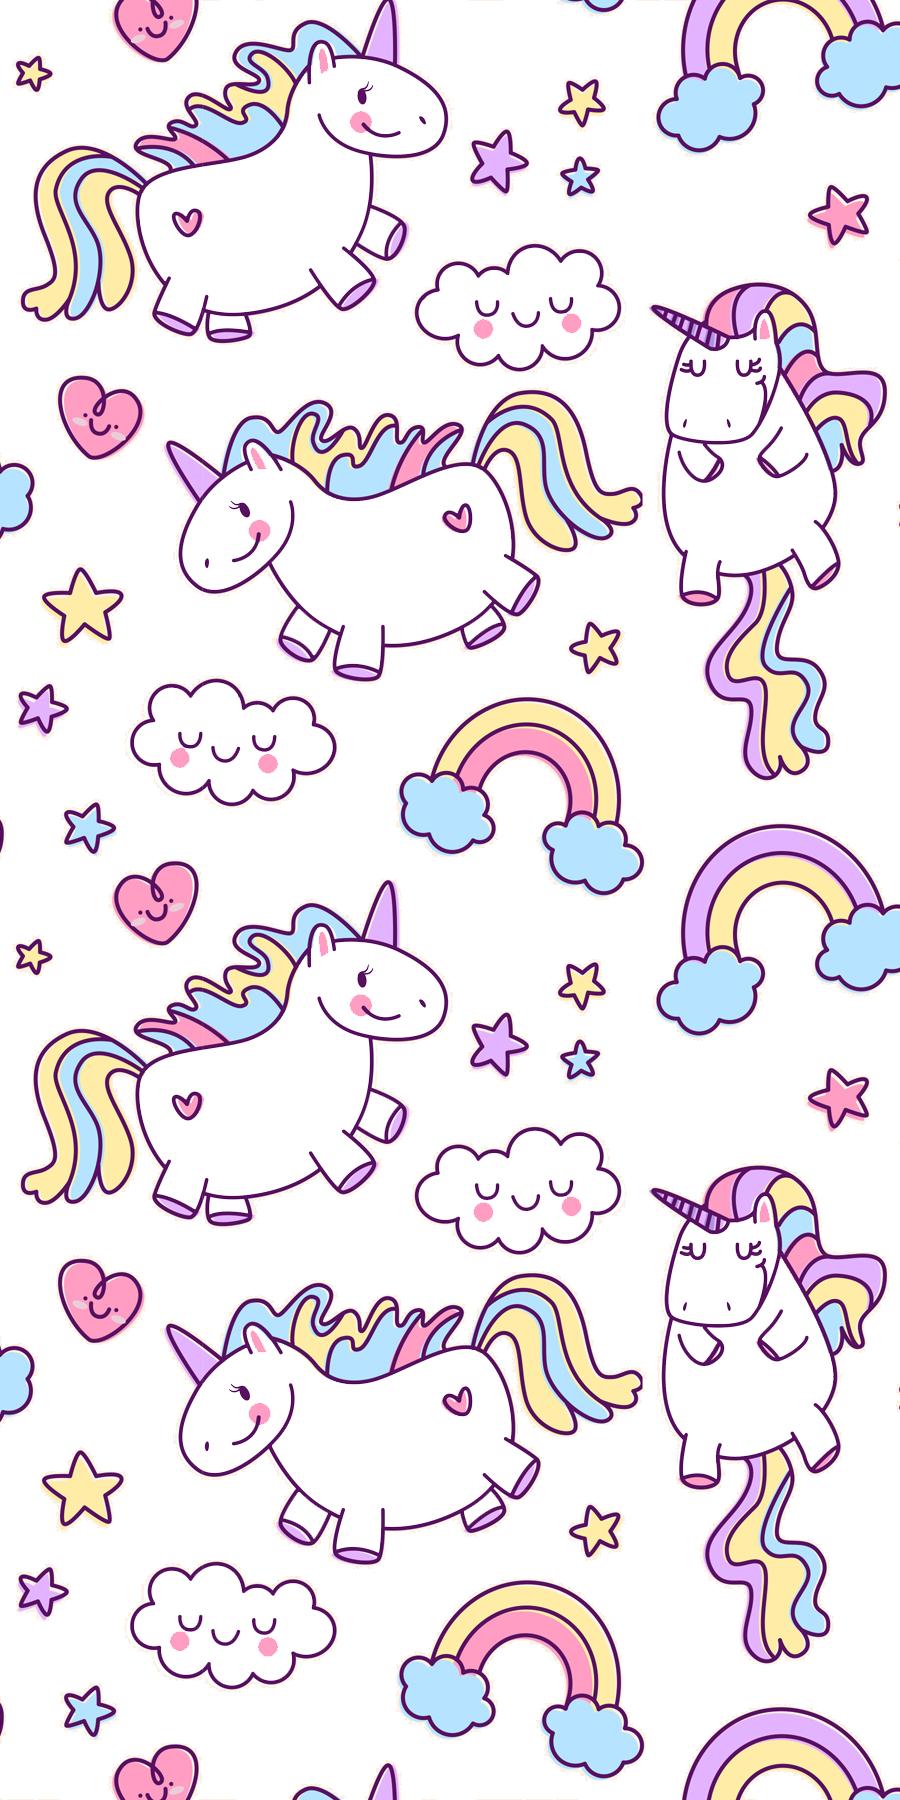 Collection Top 32 Background Unicorn Wallpaper Hd Download Di 2020 Seni Buku Ilustrasi Lucu Kuda Poni